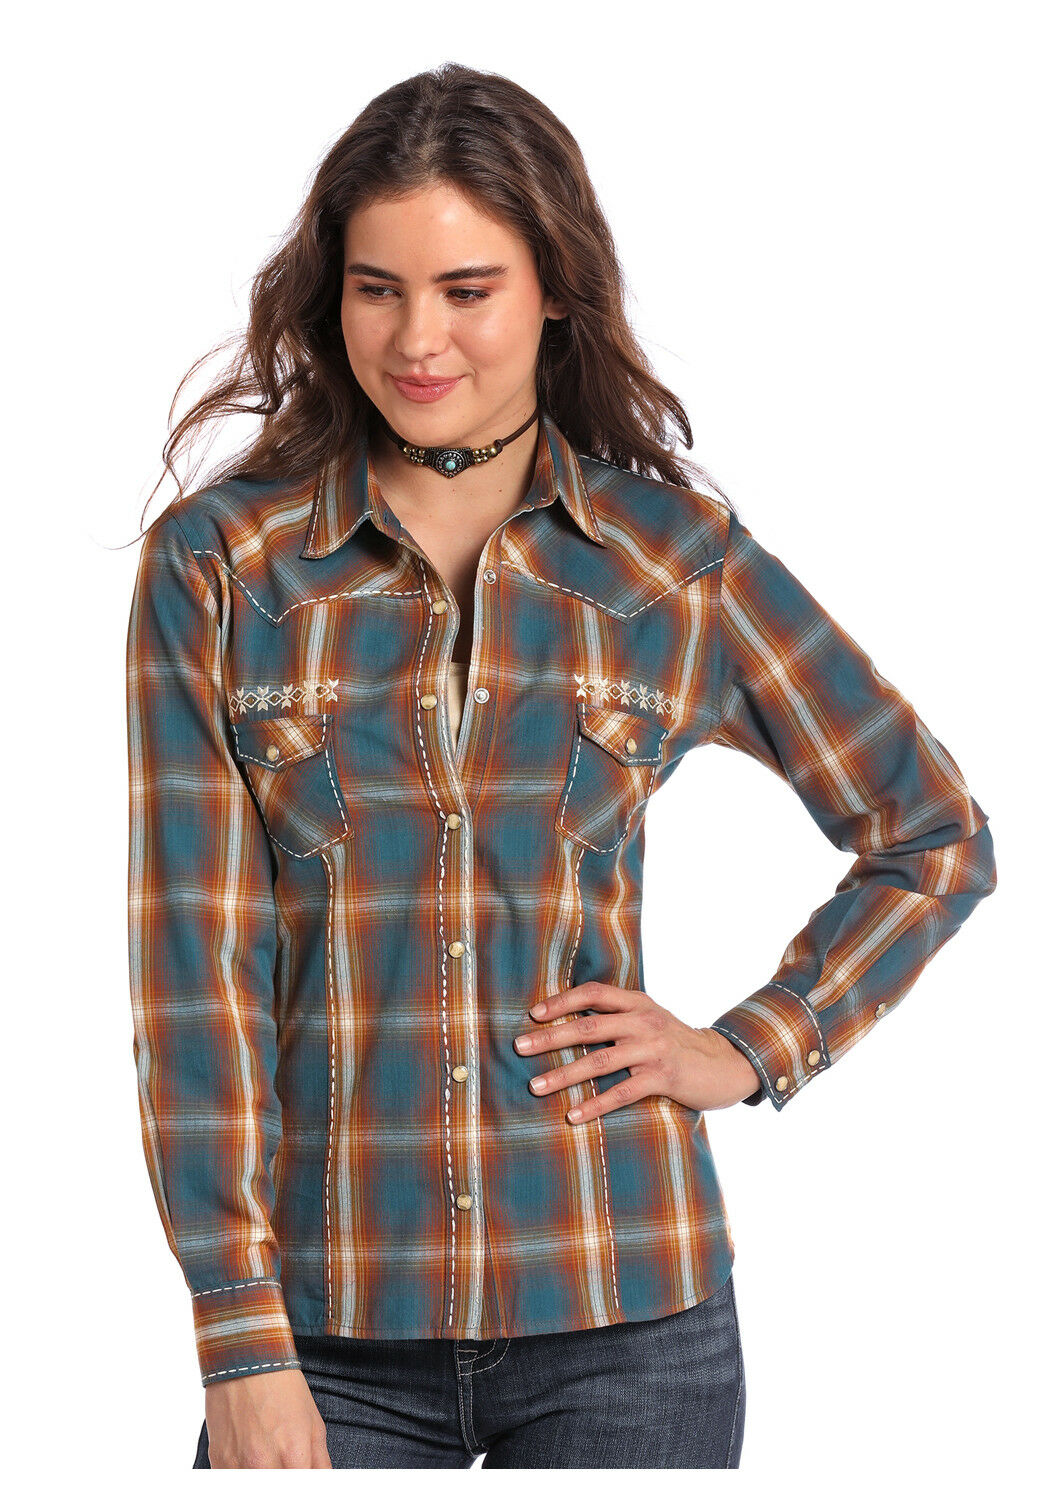 Panhandle Slim Woherren Dark Teal & Amber Plaid Snap Up Western Shirt 22S8174